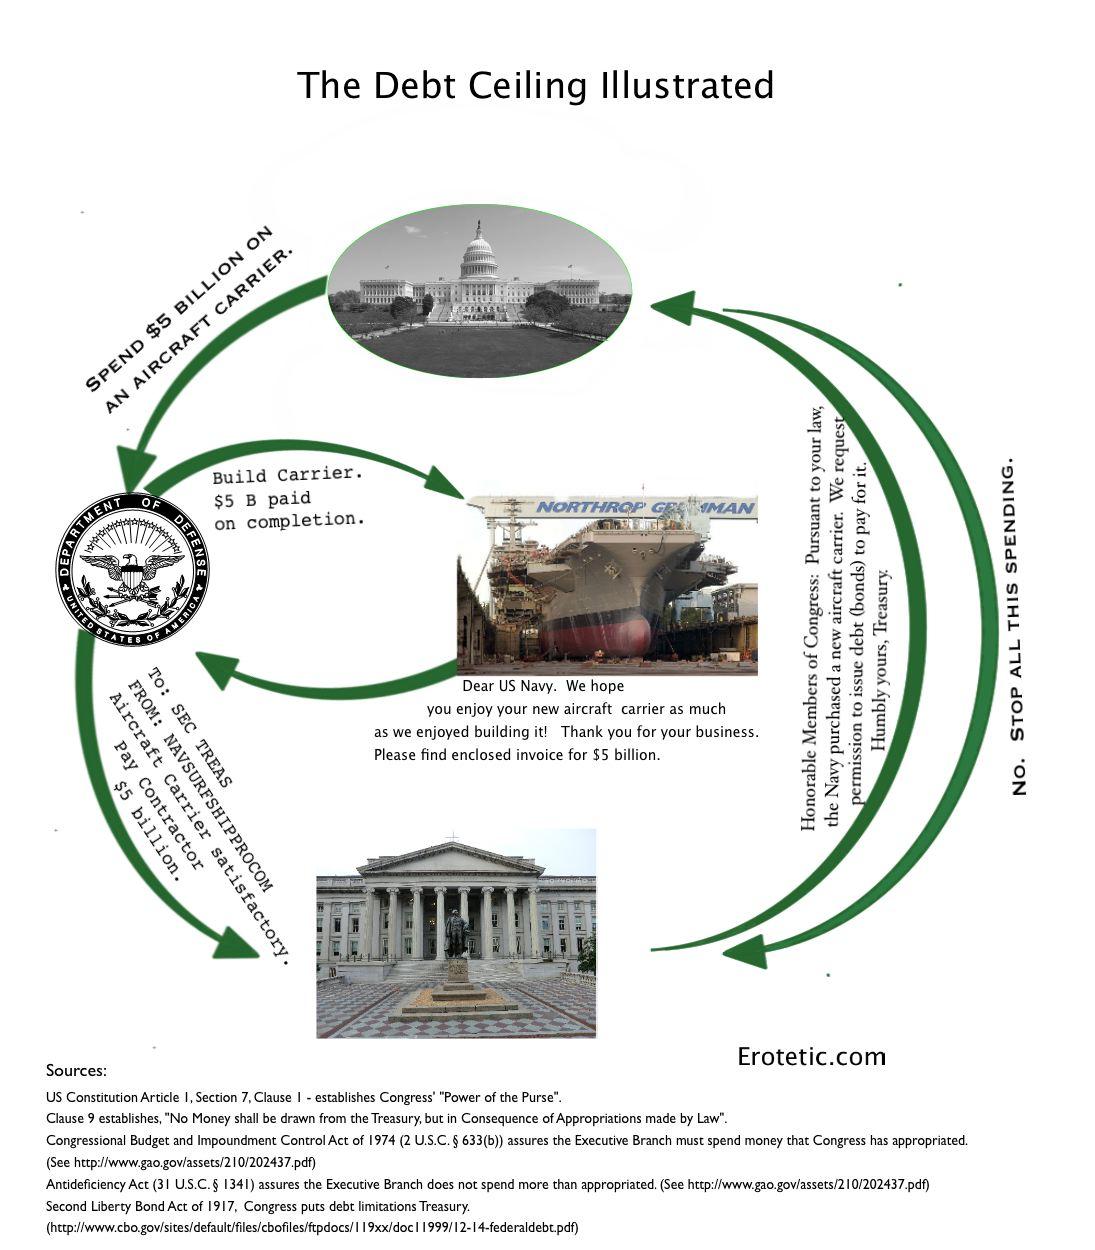 Debt ceiling illustrated1